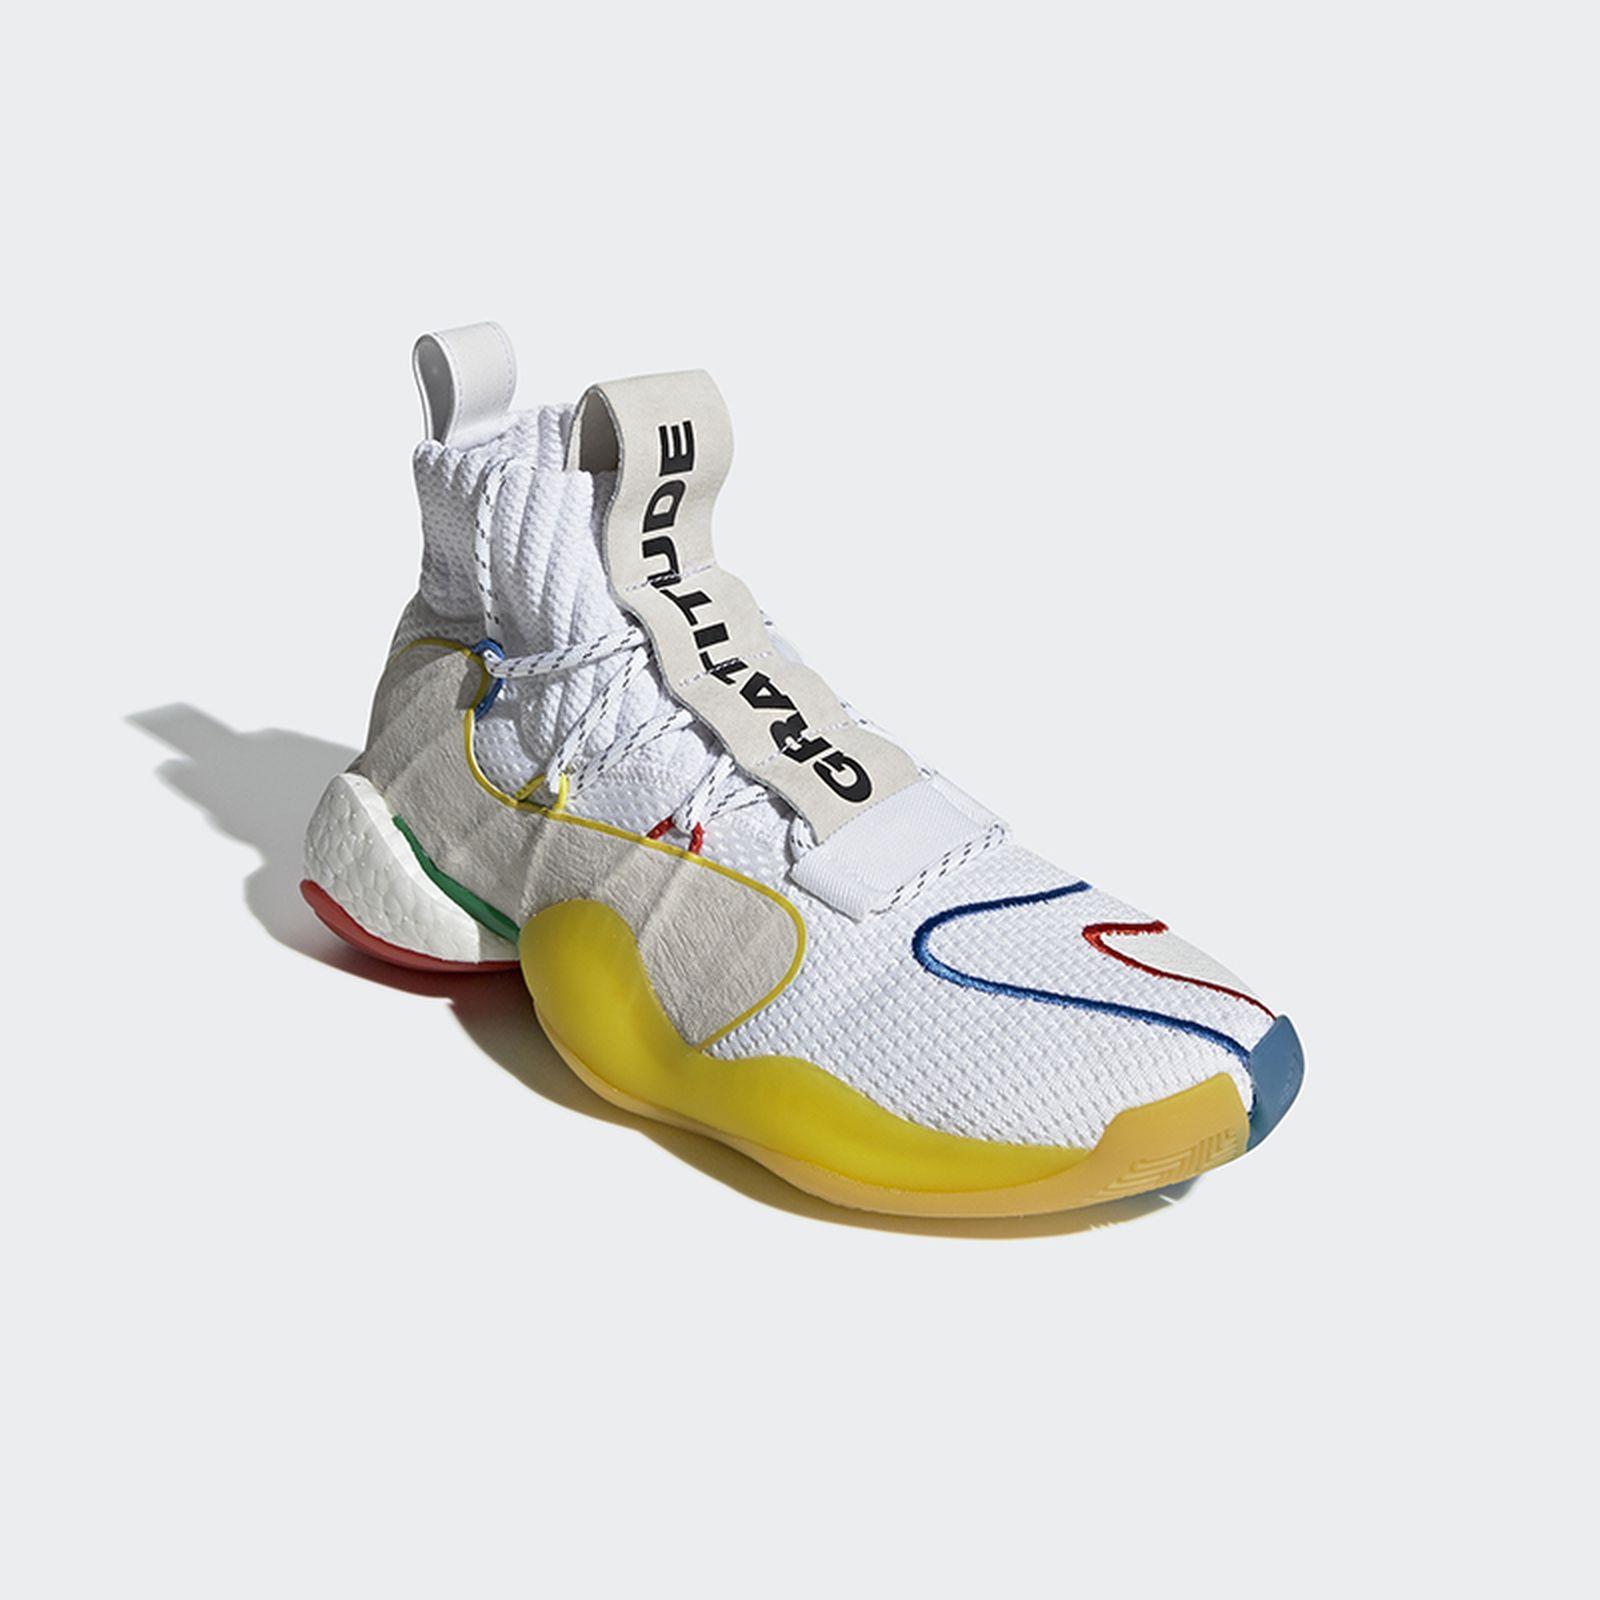 pharrell adidas crazy byw lvl x gratitude empathy white release date price